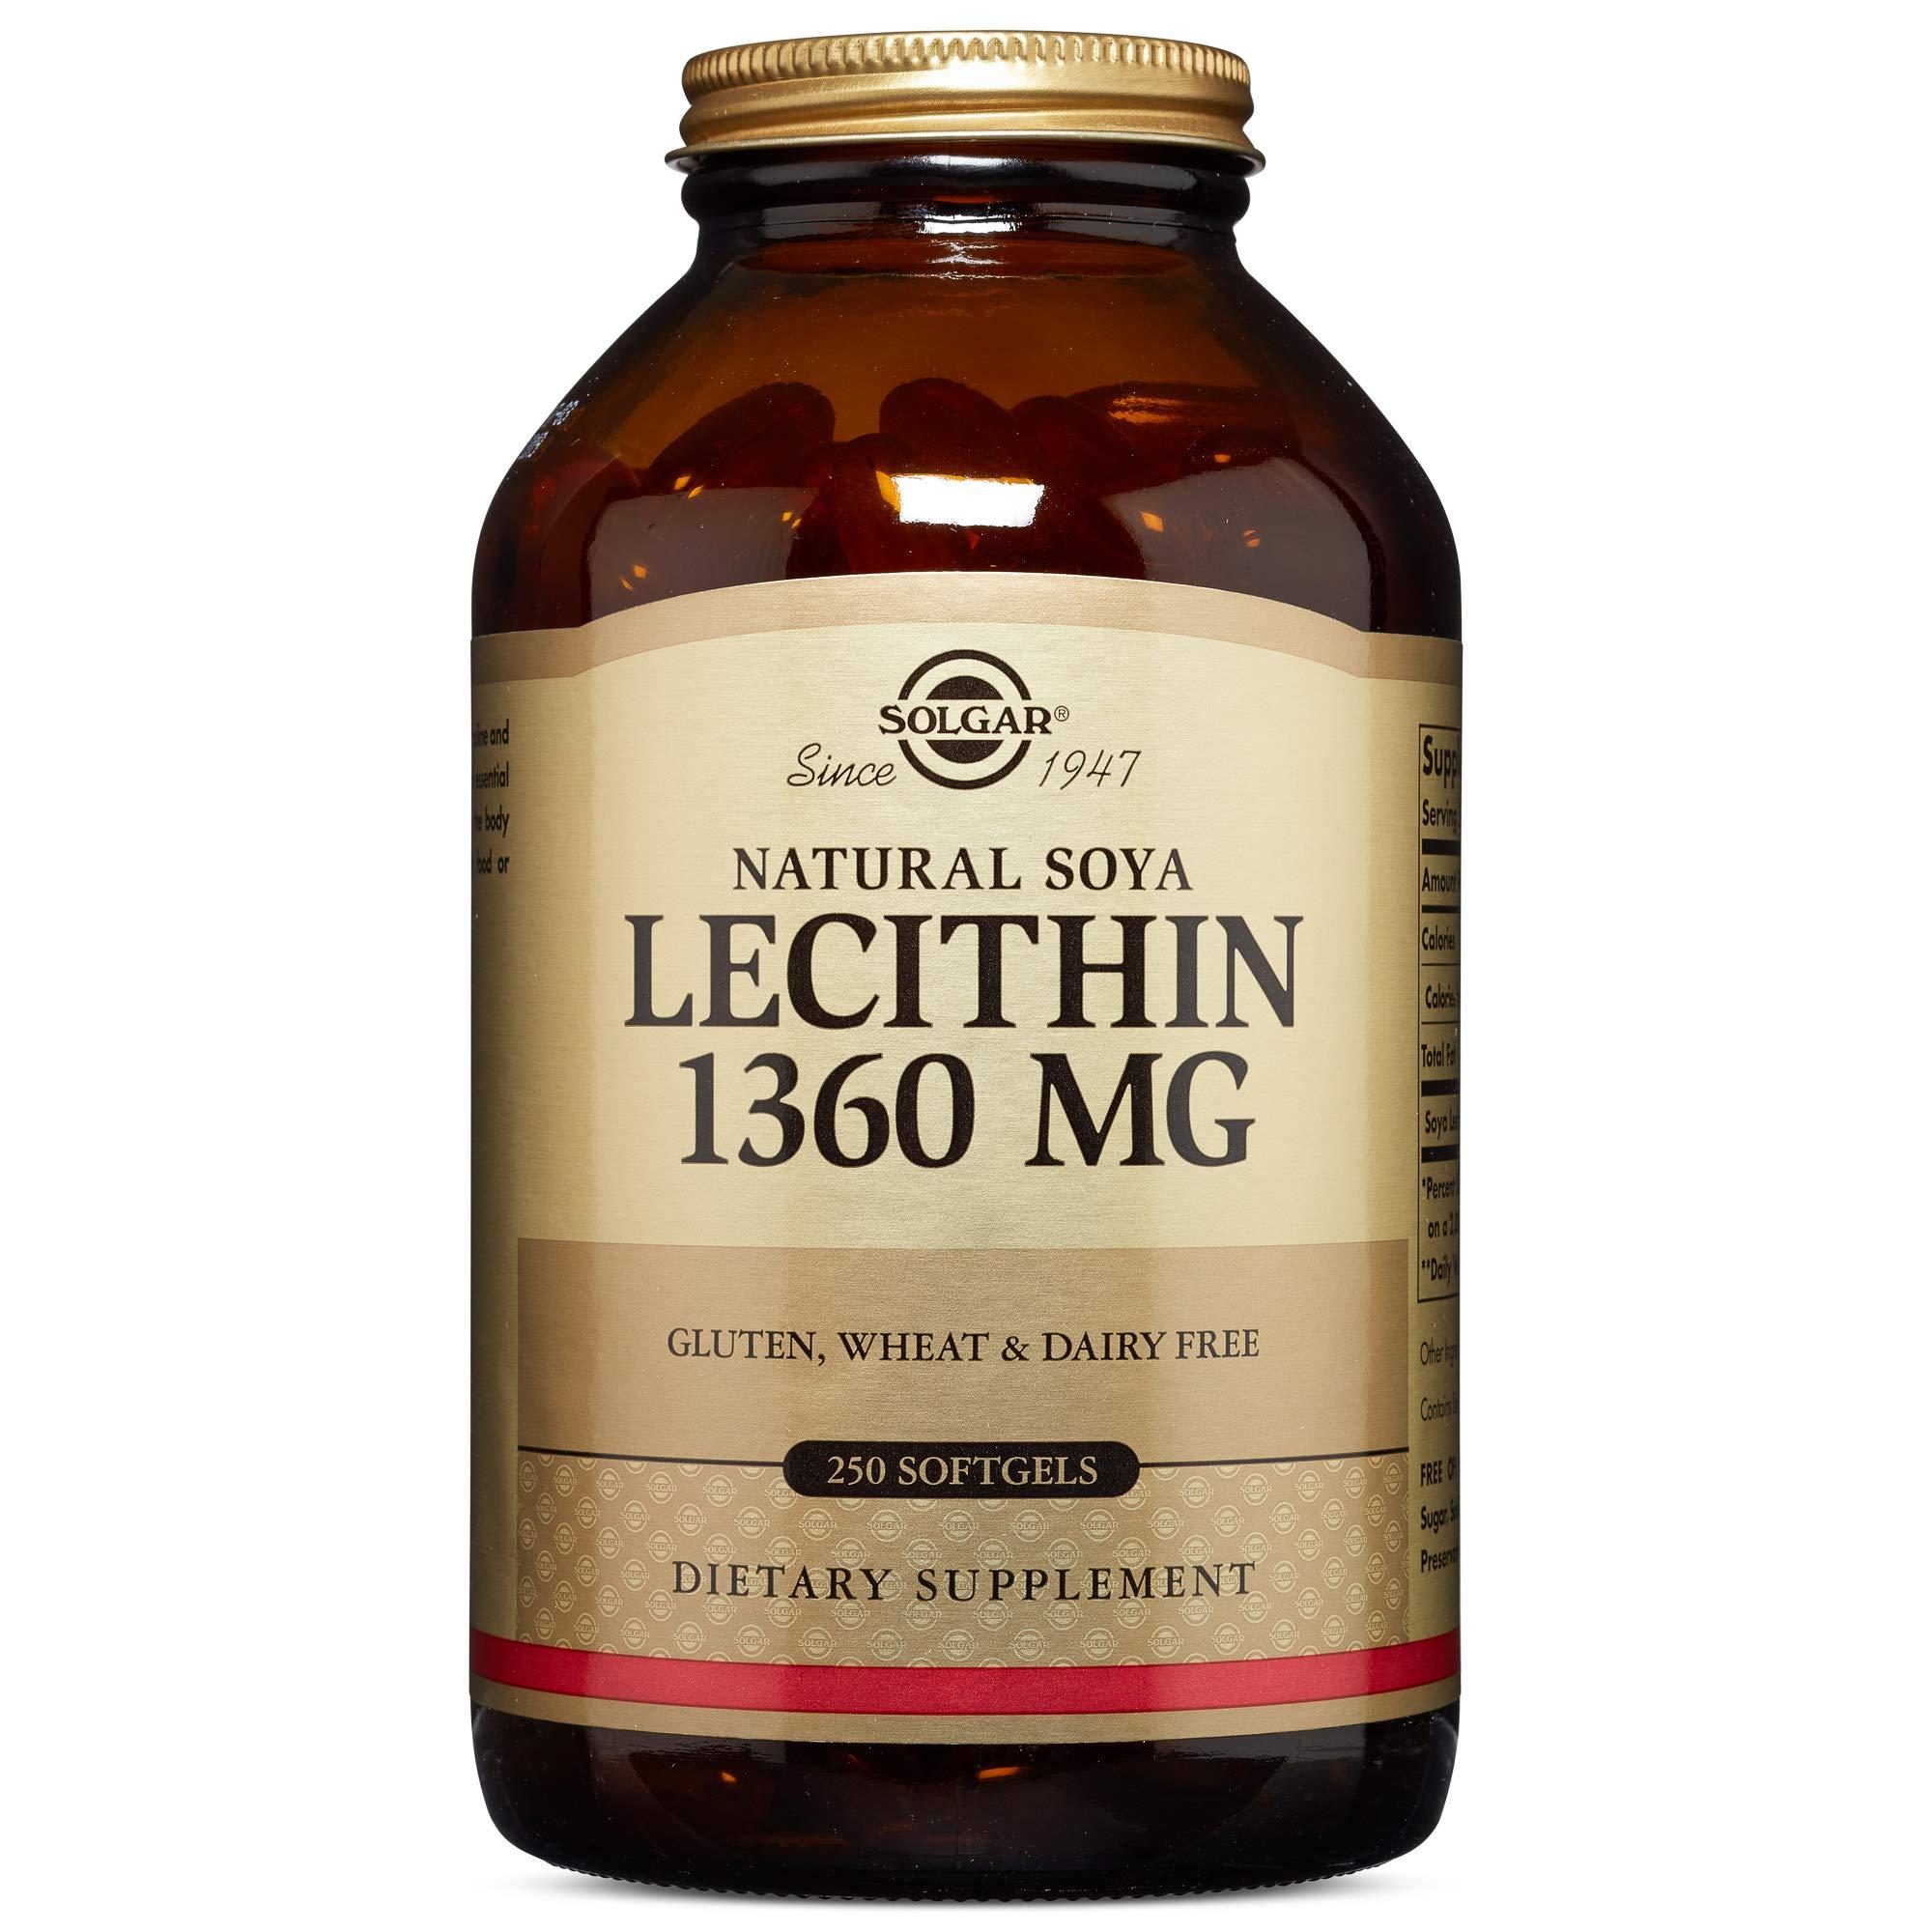 Solgar - Lecithin 1360 mg, 250 Softgels by Solgar